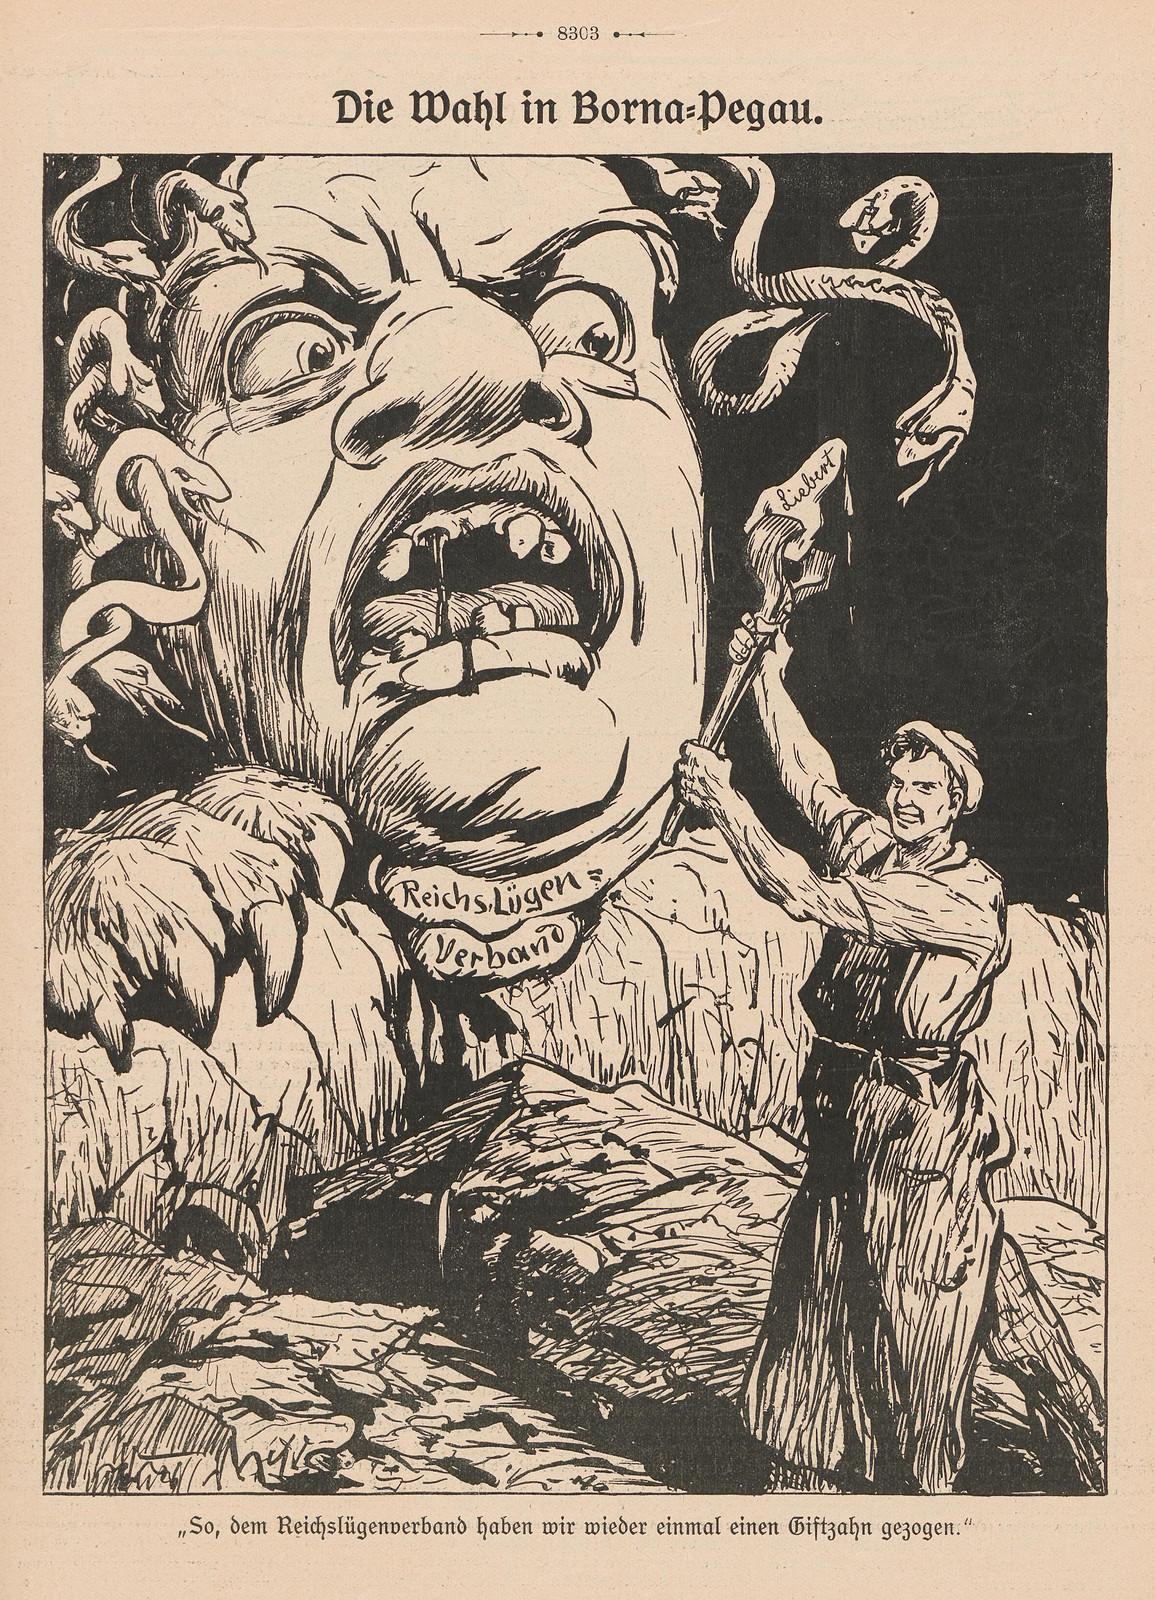 Artist Unknown - The choice in Borna-Pegau, 1914